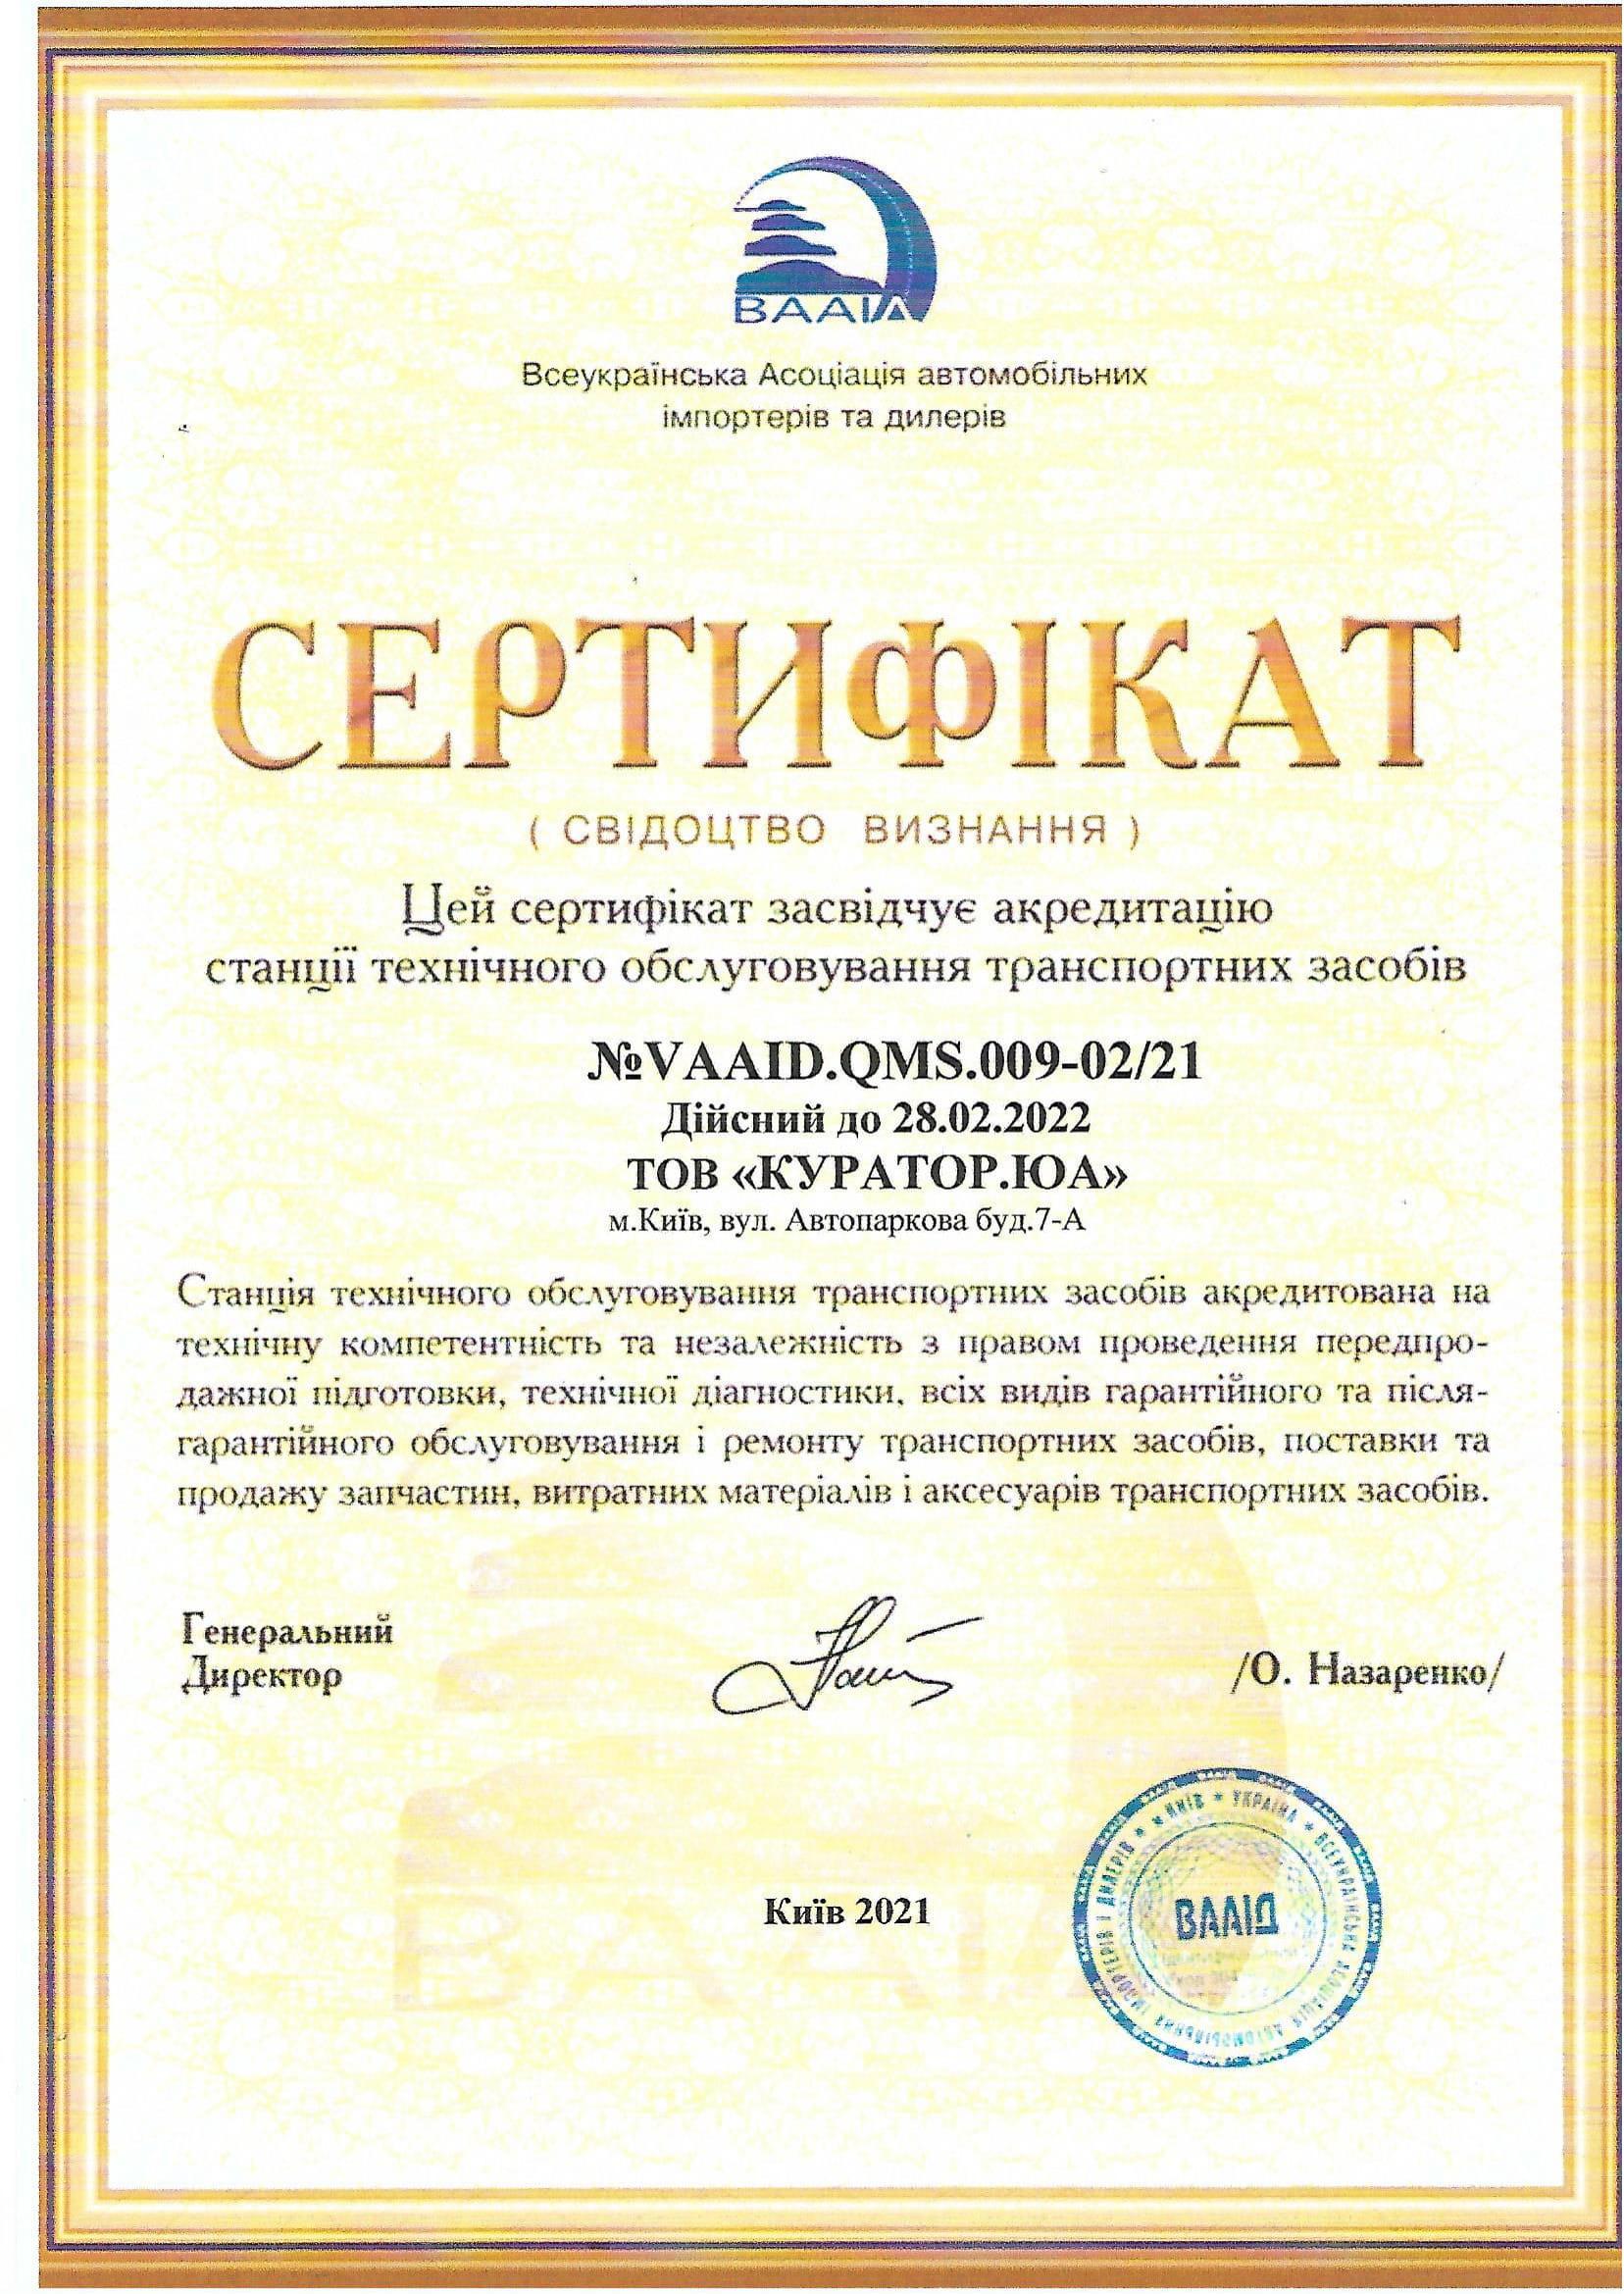 Свидетельство об аккредитации Автосервиса Куратор.ЮА